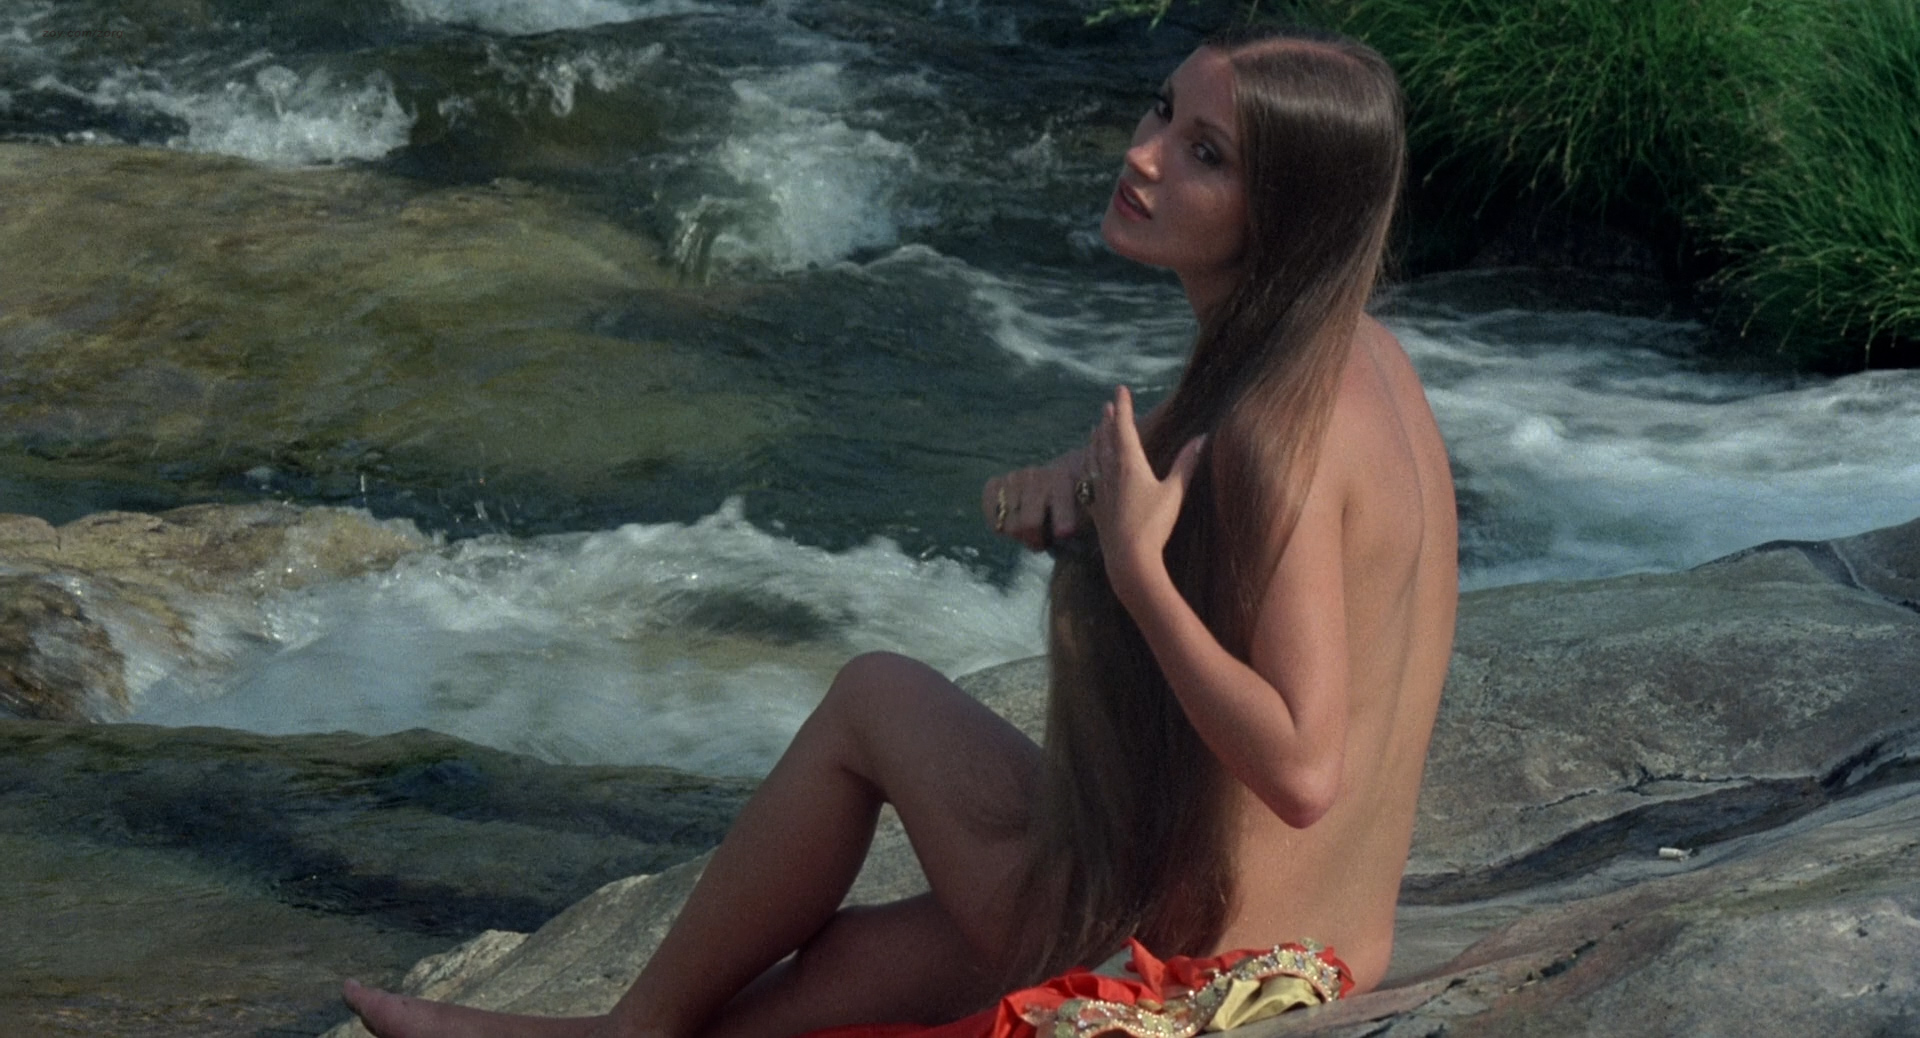 Jane Seymour nude side boob and nipple and Taryn Power nude side boob -  Sinbad and